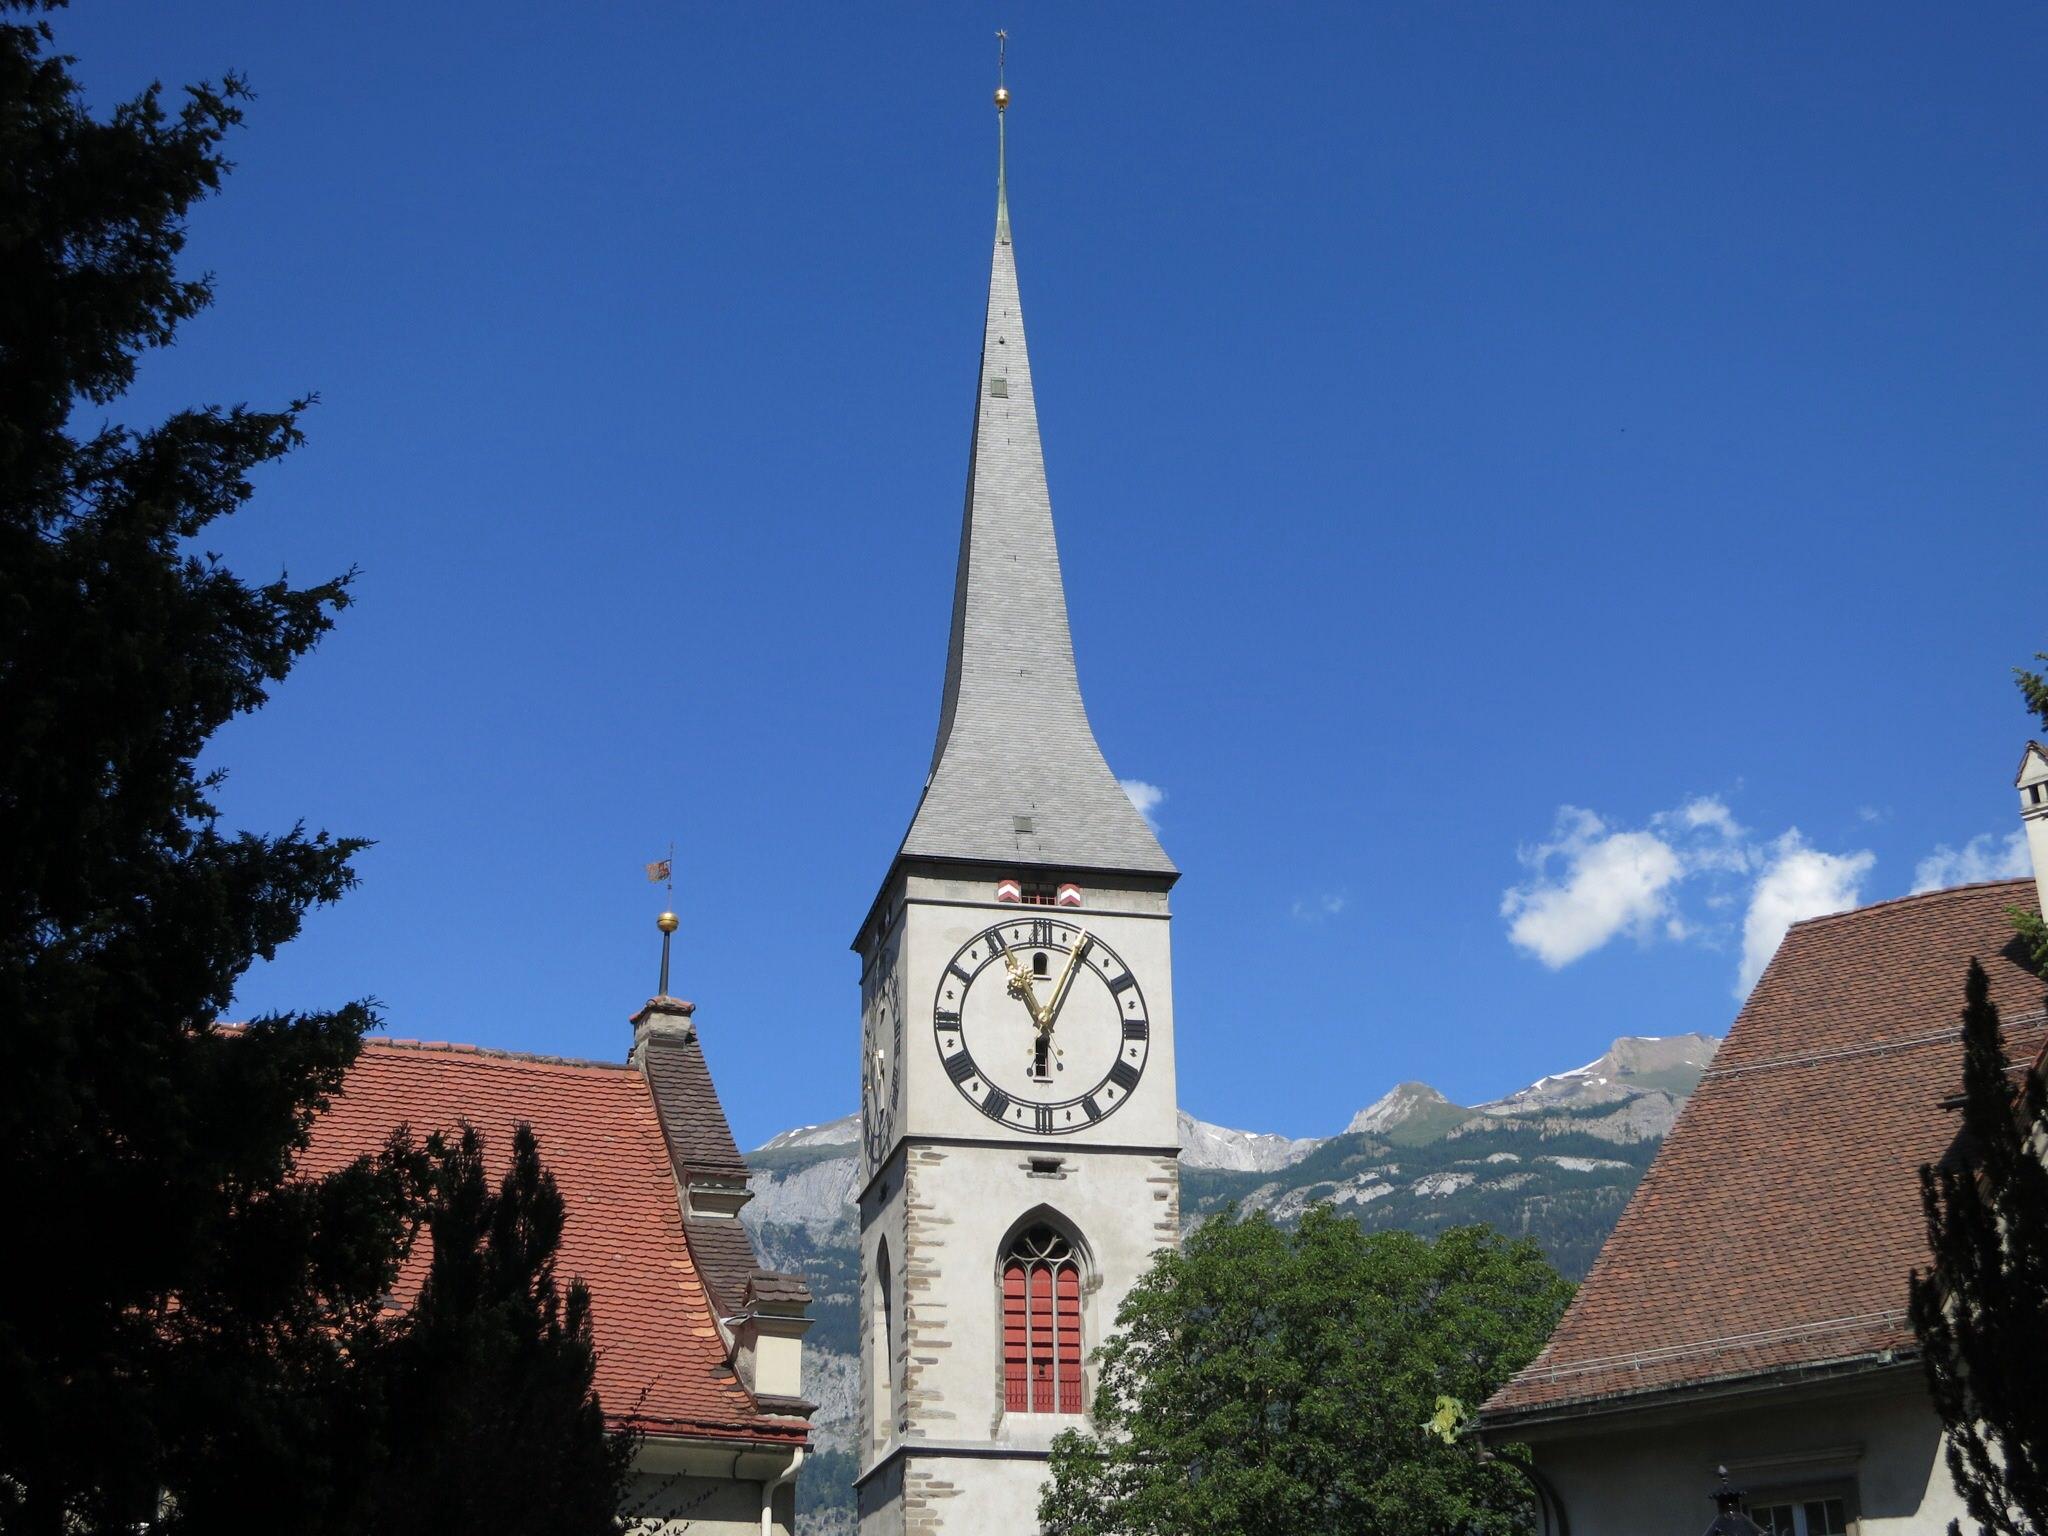 Chur Switzerland  city photos gallery : chur switzerland | Bird Brain Designs